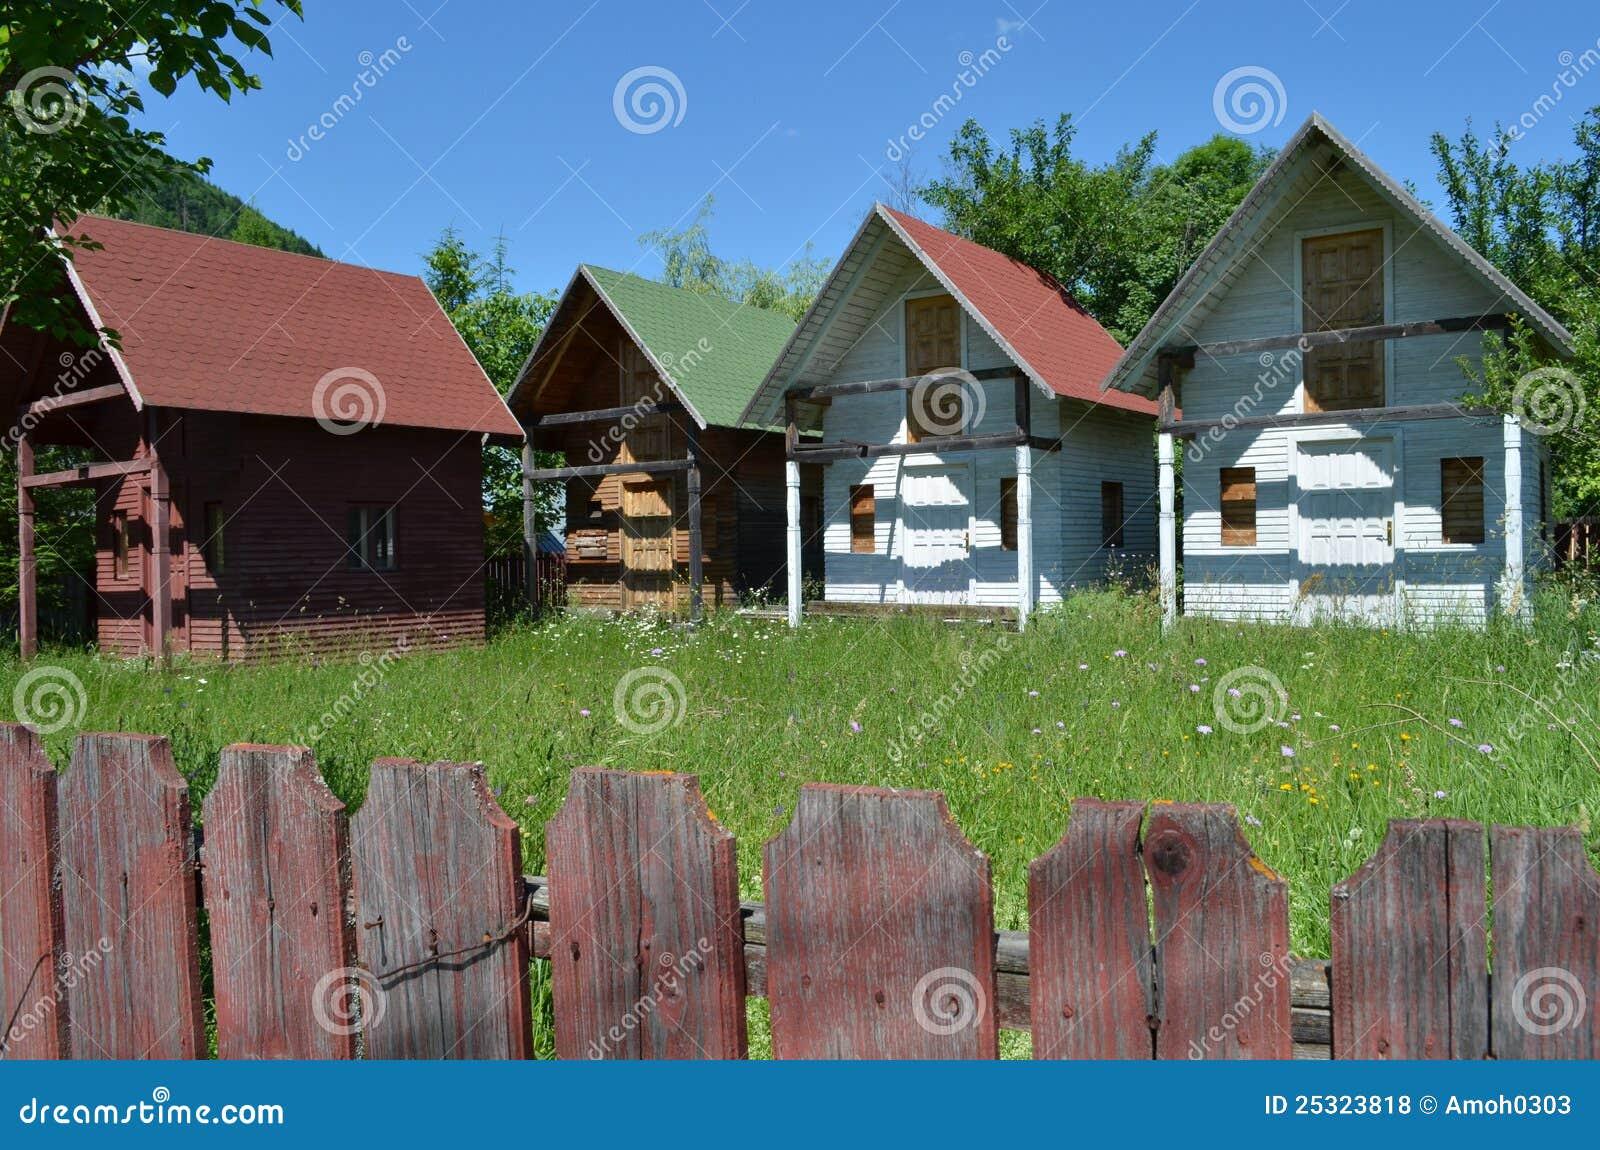 minih user lizenzfreie stockfotos bild 25323818. Black Bedroom Furniture Sets. Home Design Ideas